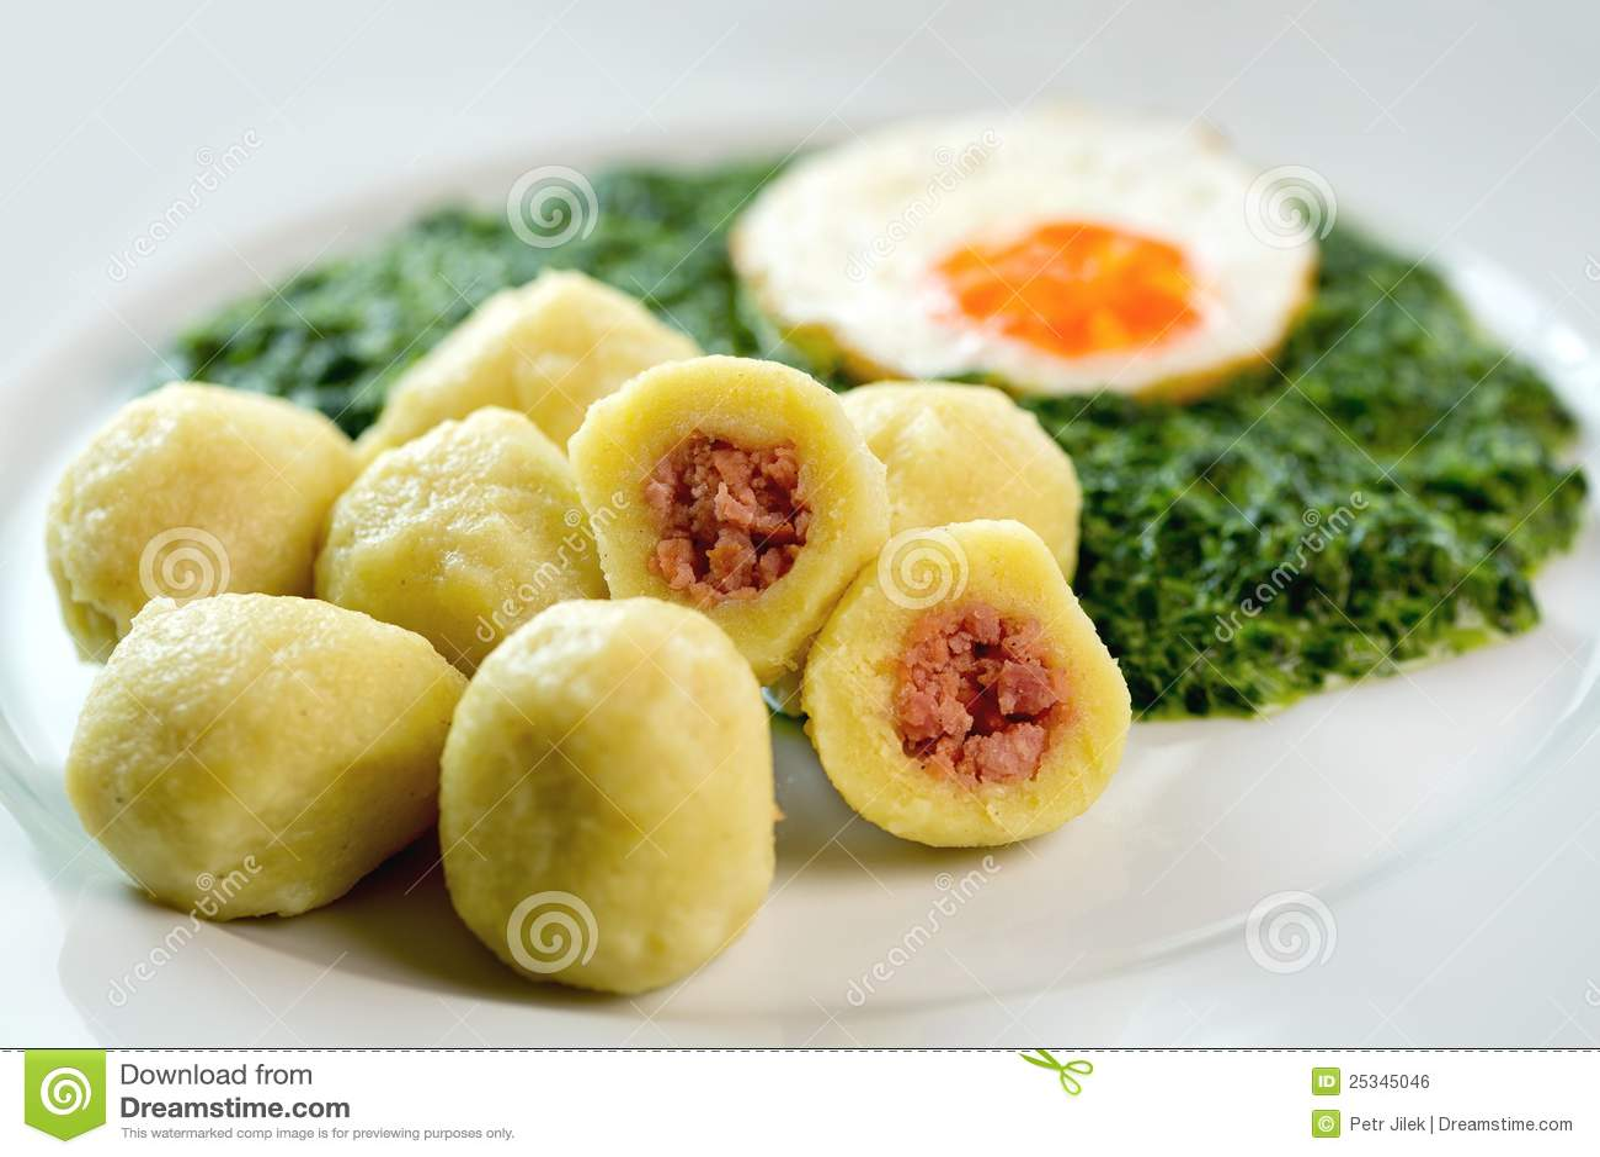 Stuffed potato dumplings with smoked meat